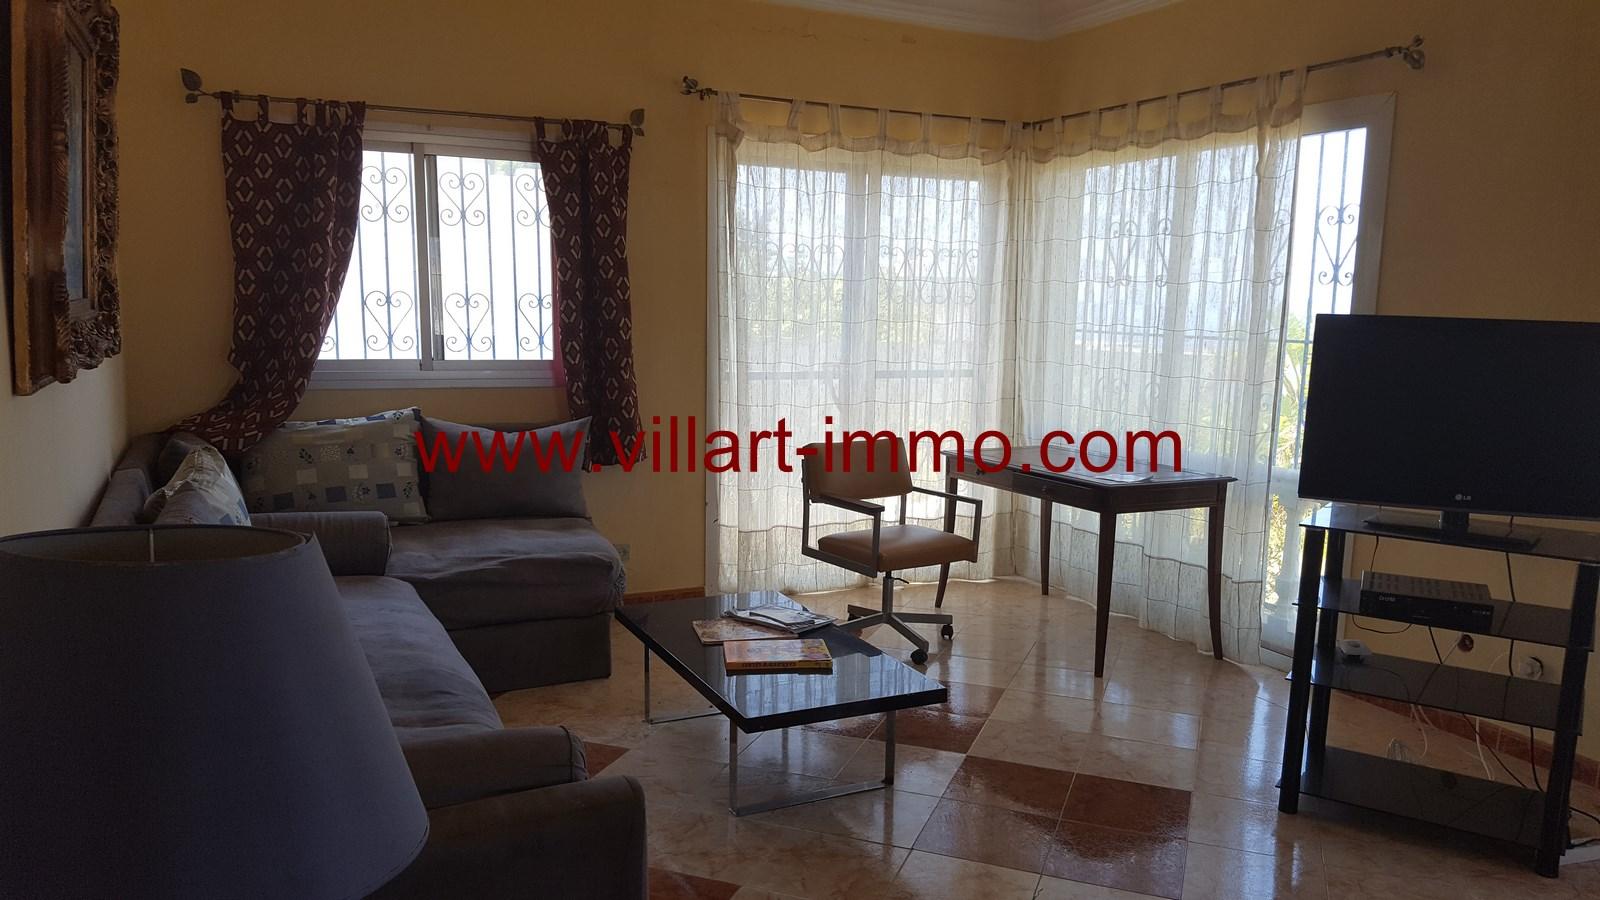 4-a-vendre-tanger-villa-salon-1-vv427-villart-immo-agence-immobiliere